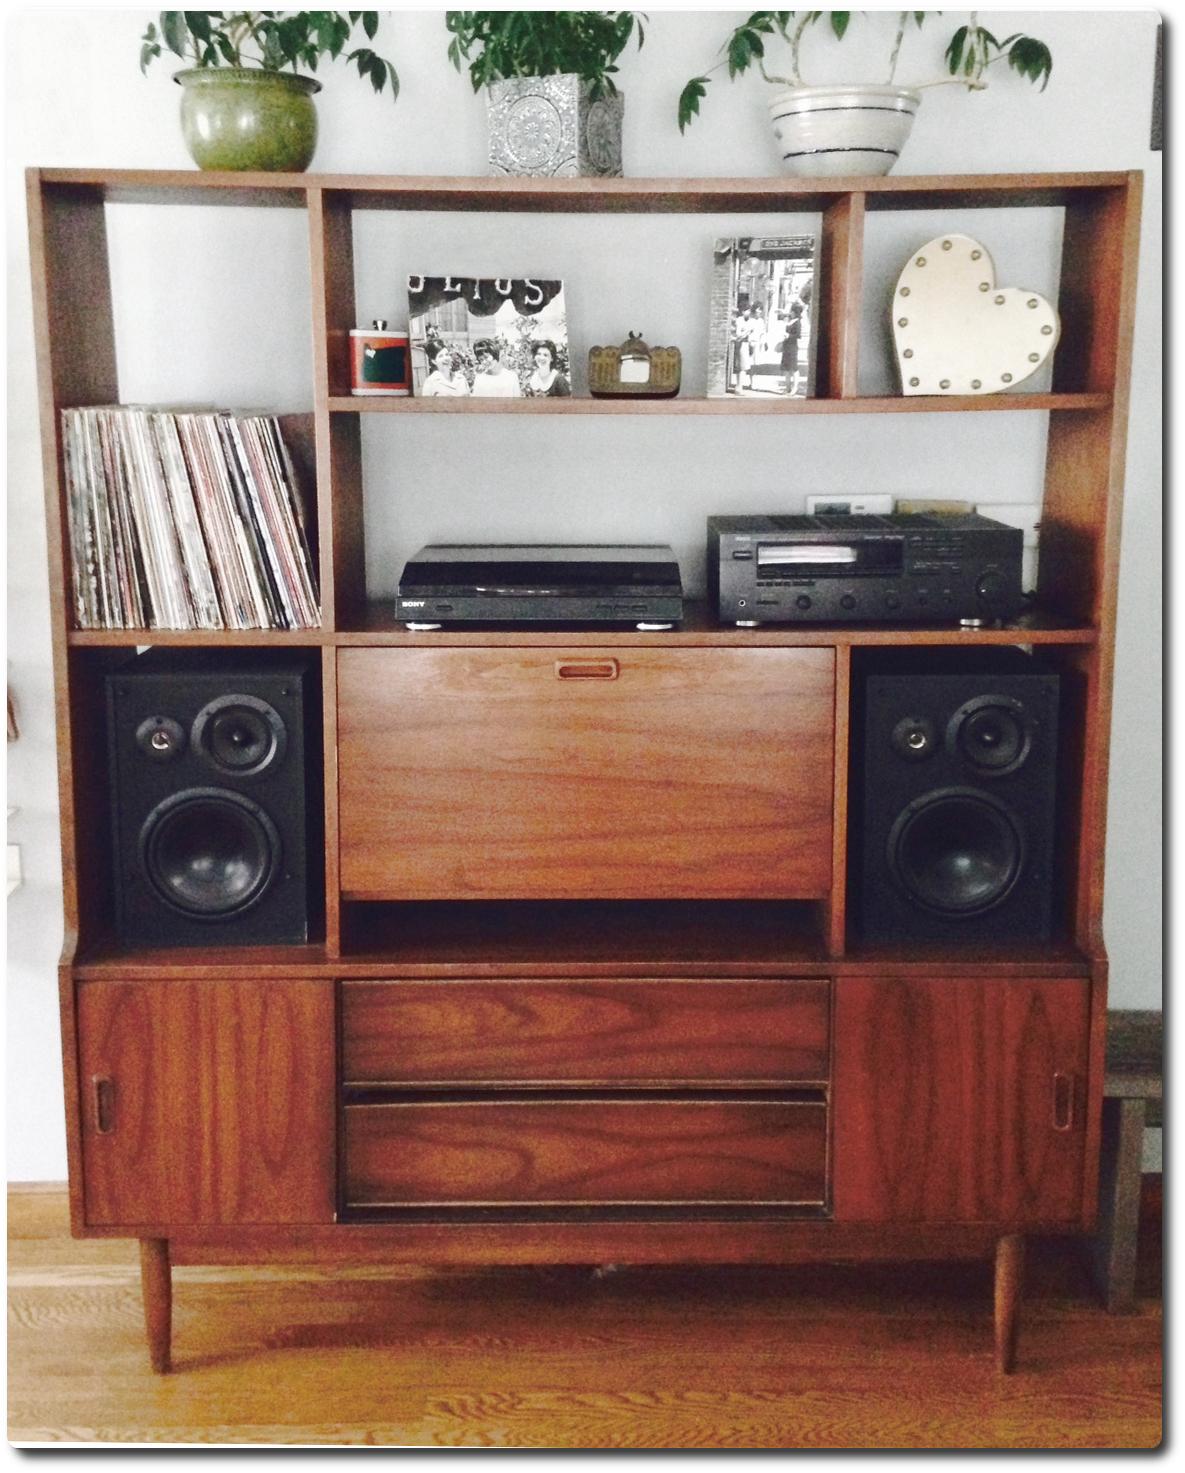 mid-century double-sided display shelf